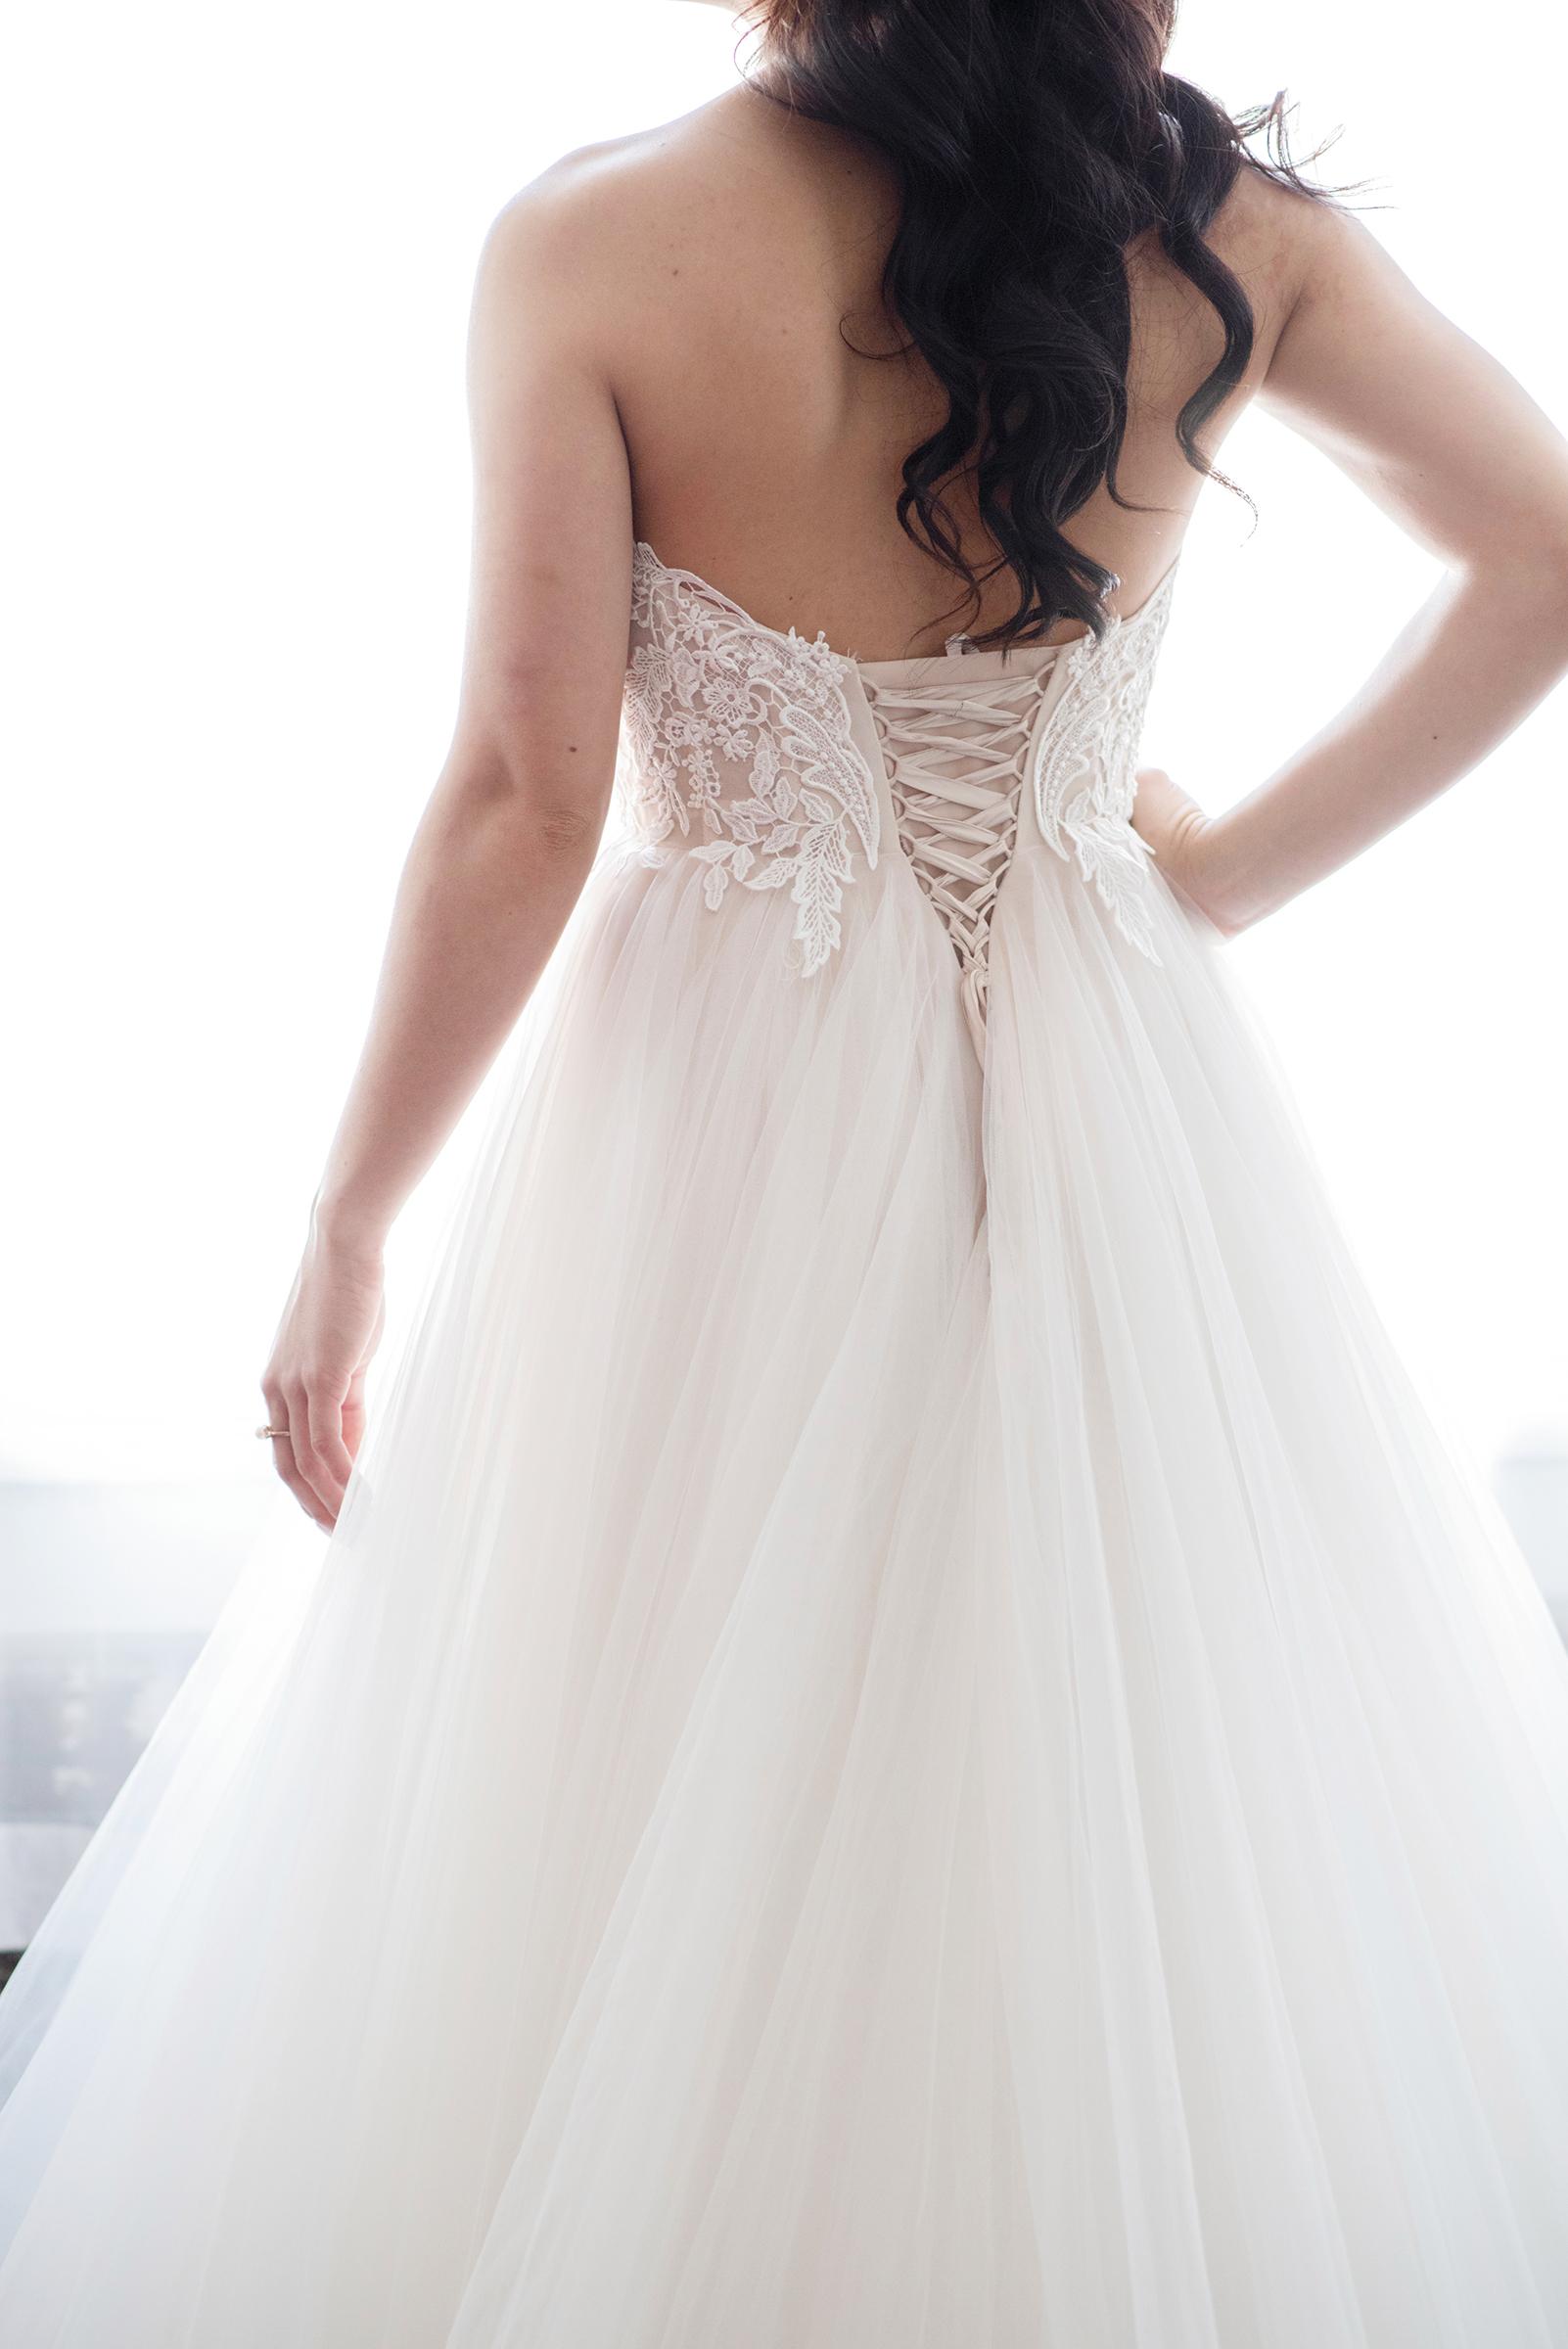 Stephanie-Fourth Dress Details-4.jpg